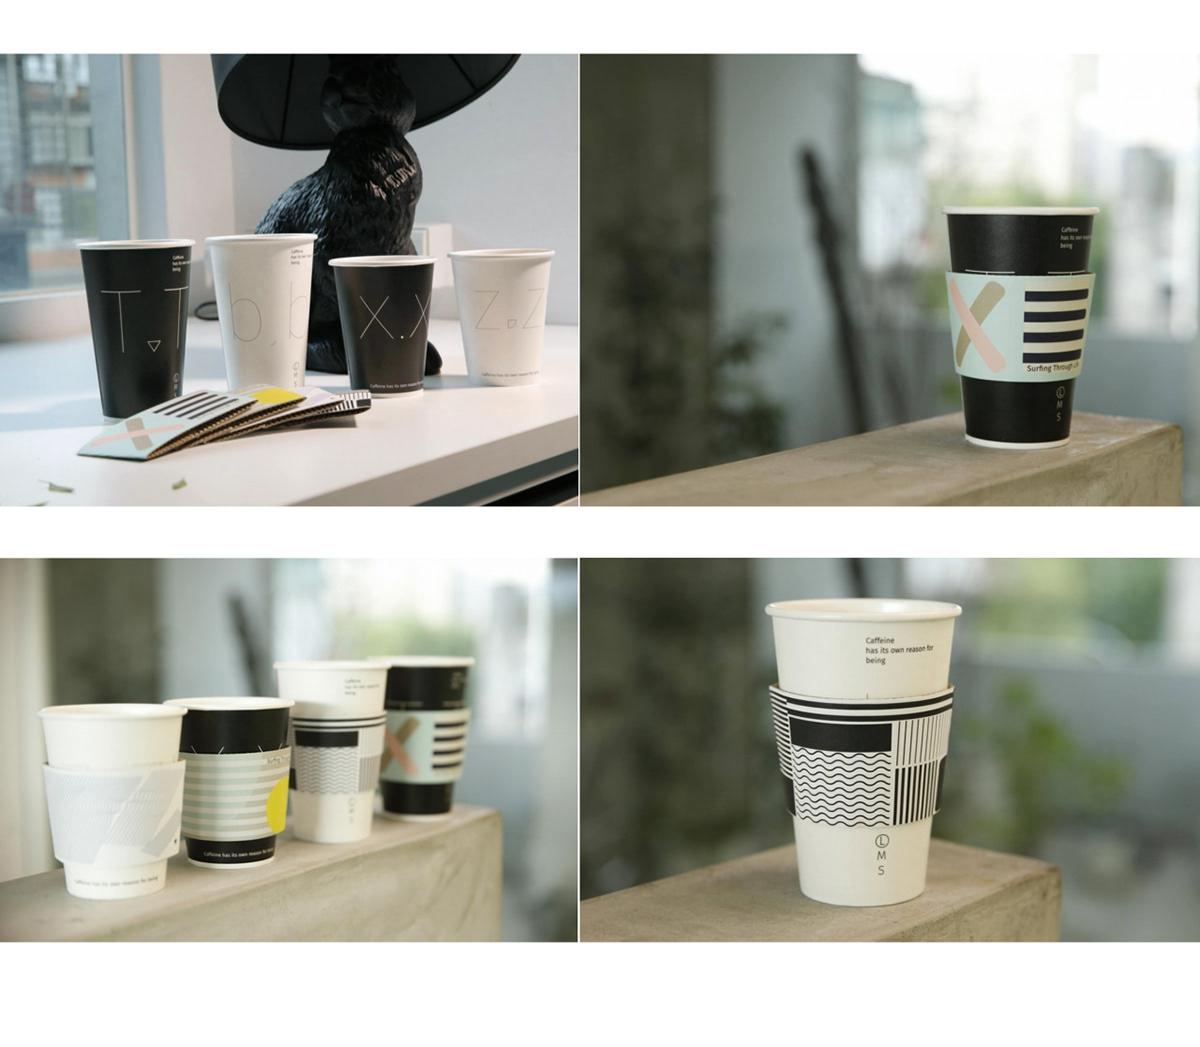 citycafe cafe taiwan 7-11 cup summer